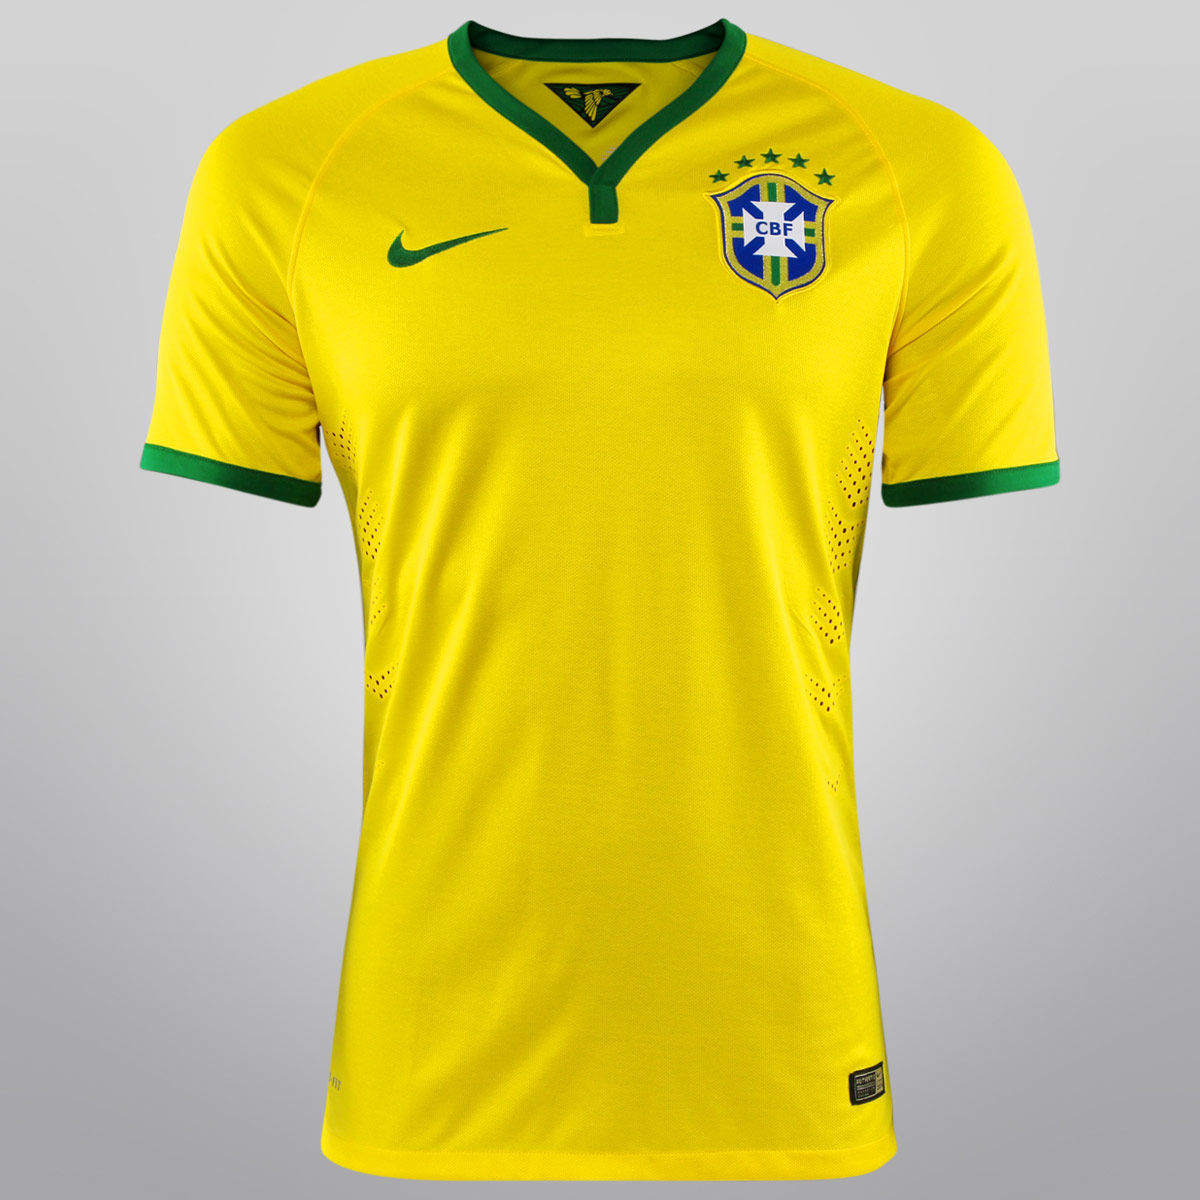 00f2cdee87f09 Uniformes PES PS2  Uniforme do Brasil 2014 15